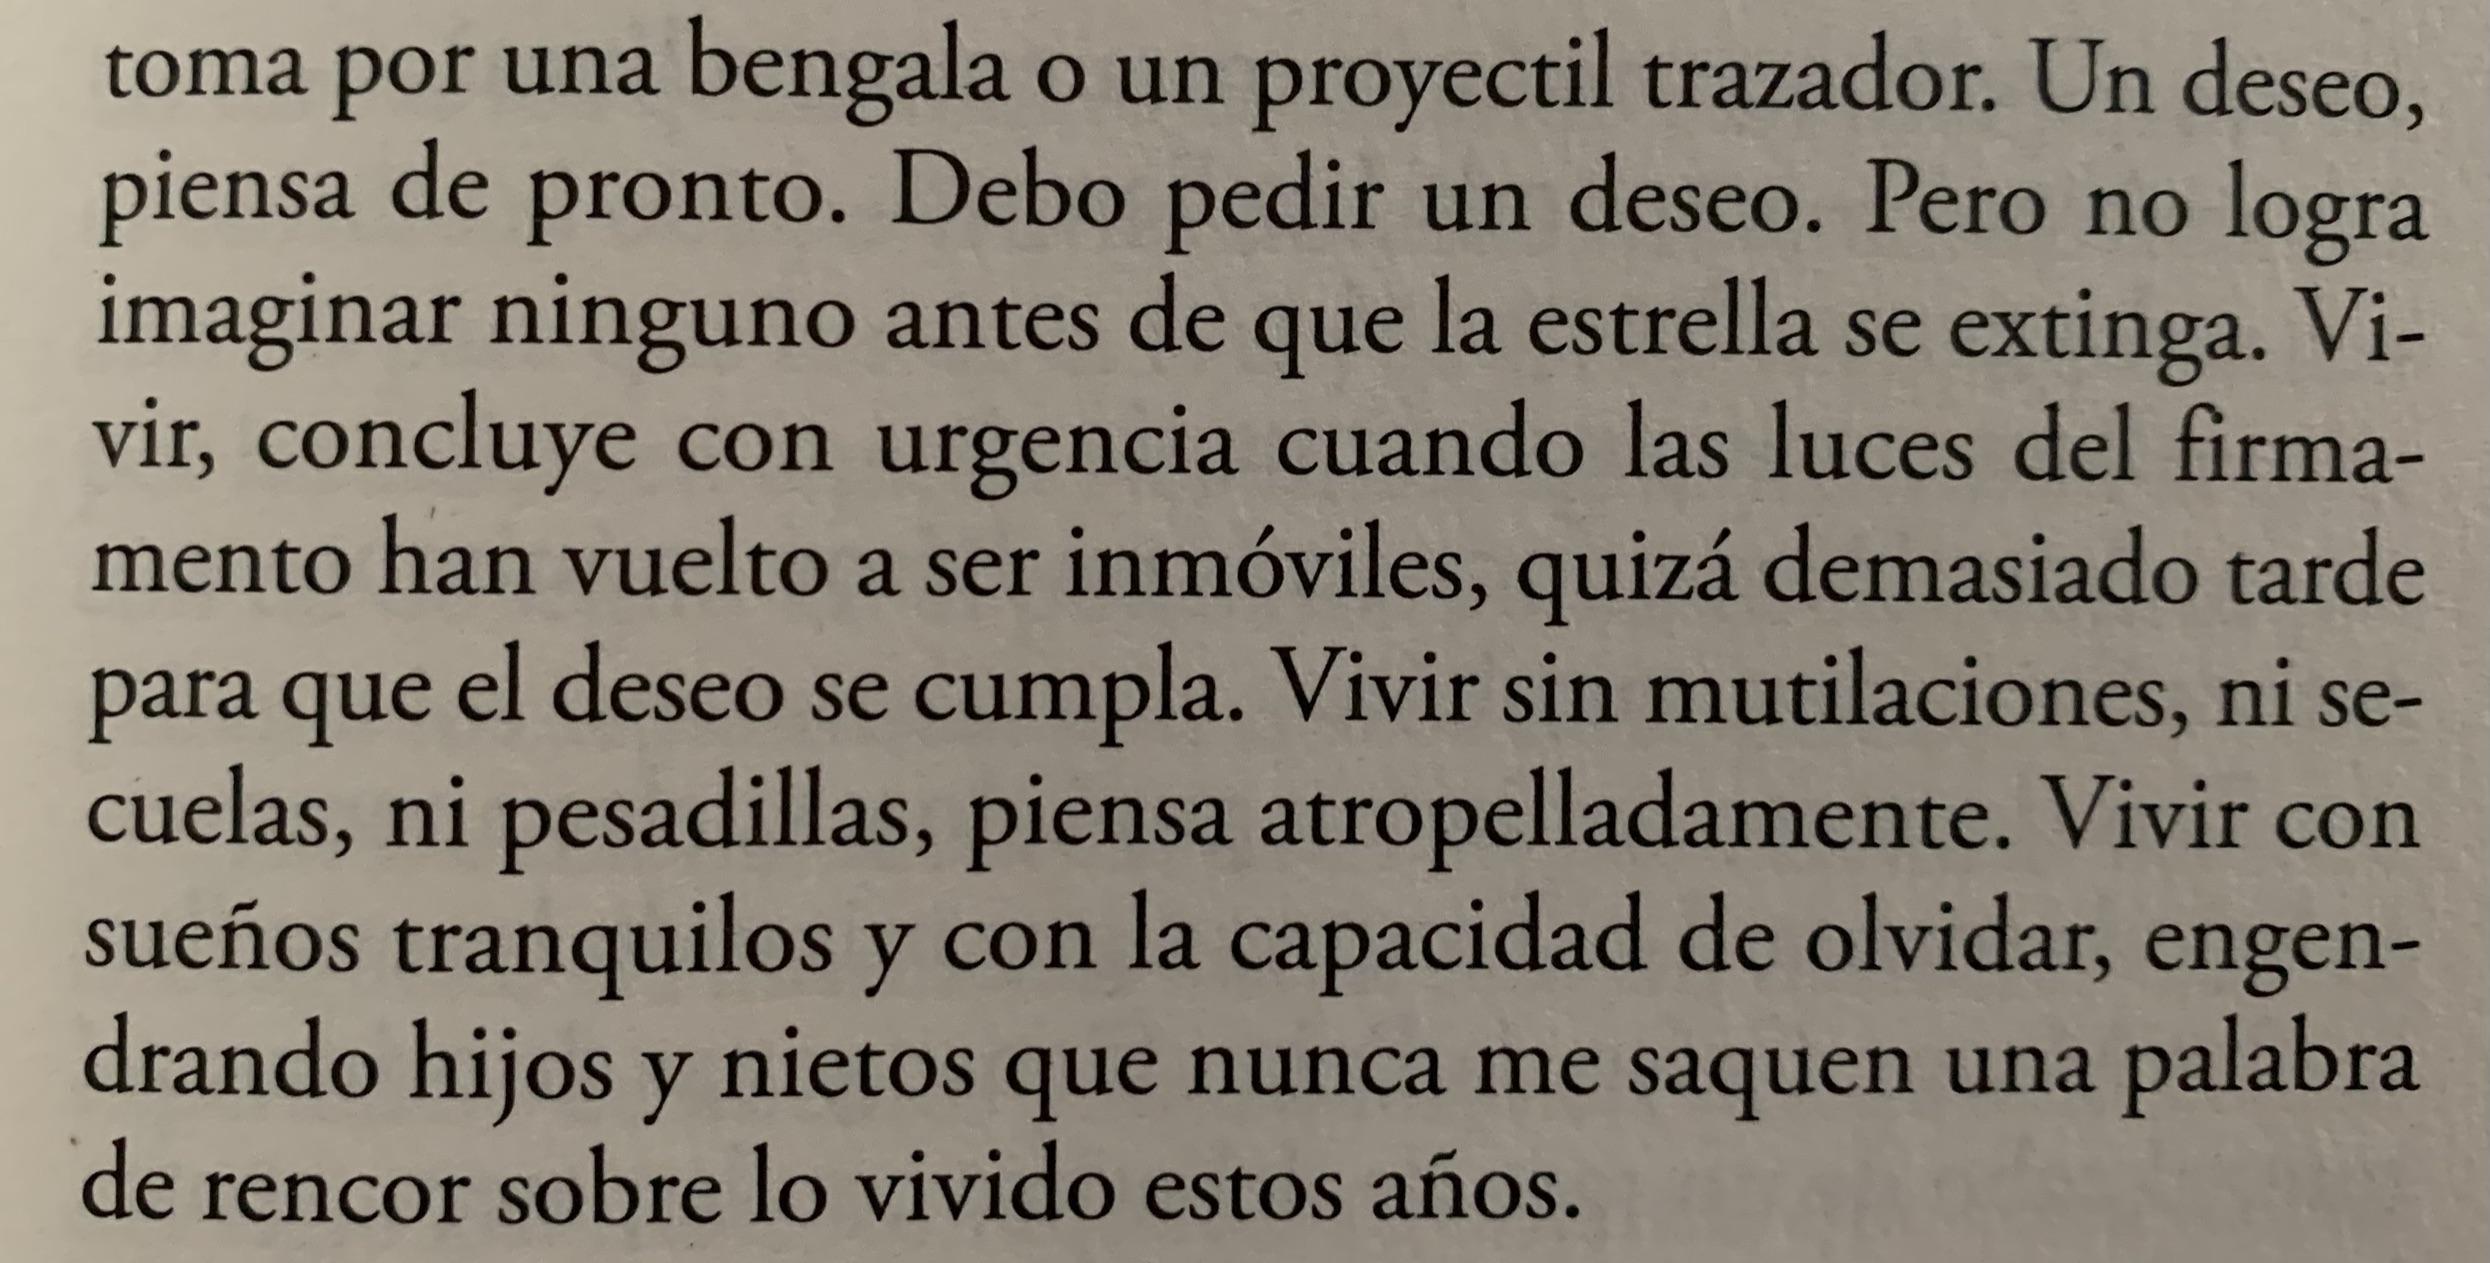 Fragmento del libro Línea de fuego de Arturo Pérez-Reverte